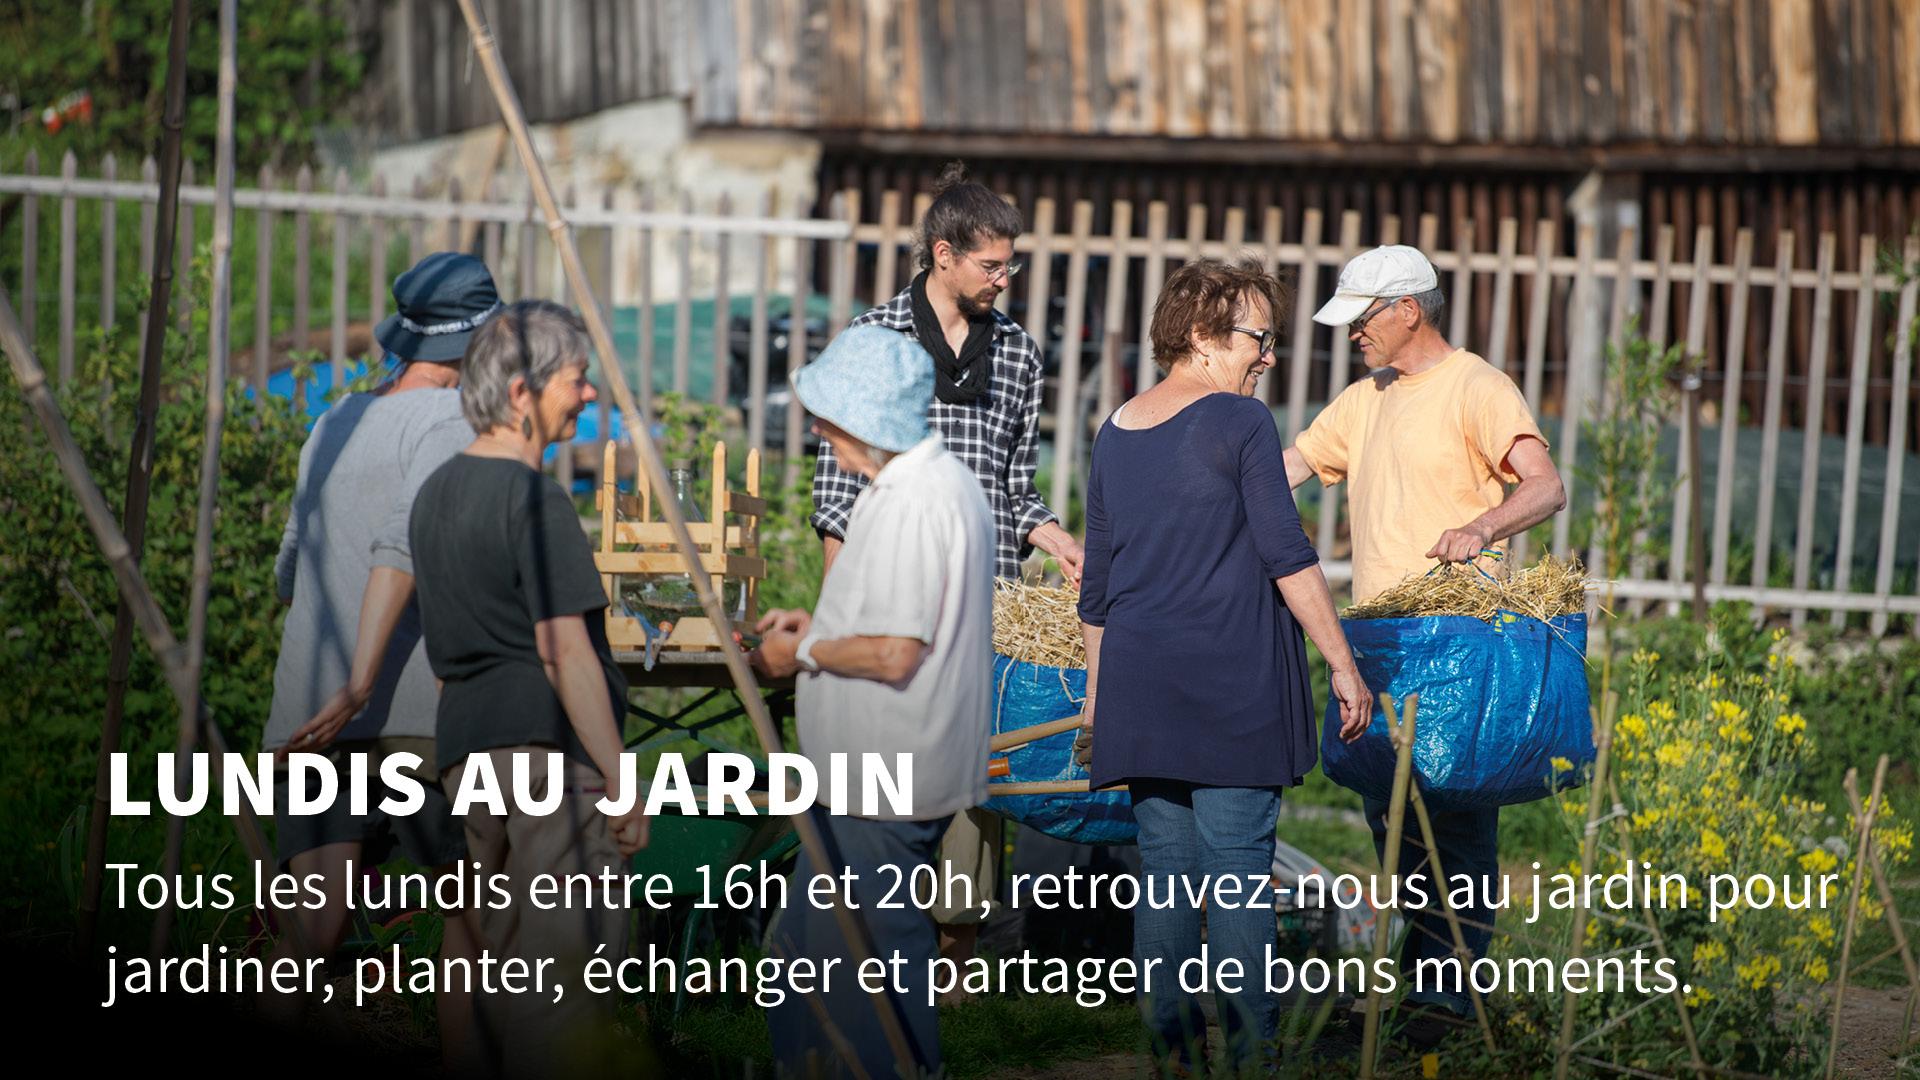 https://www.1000mains.ch/activites/accueil-citoyen/